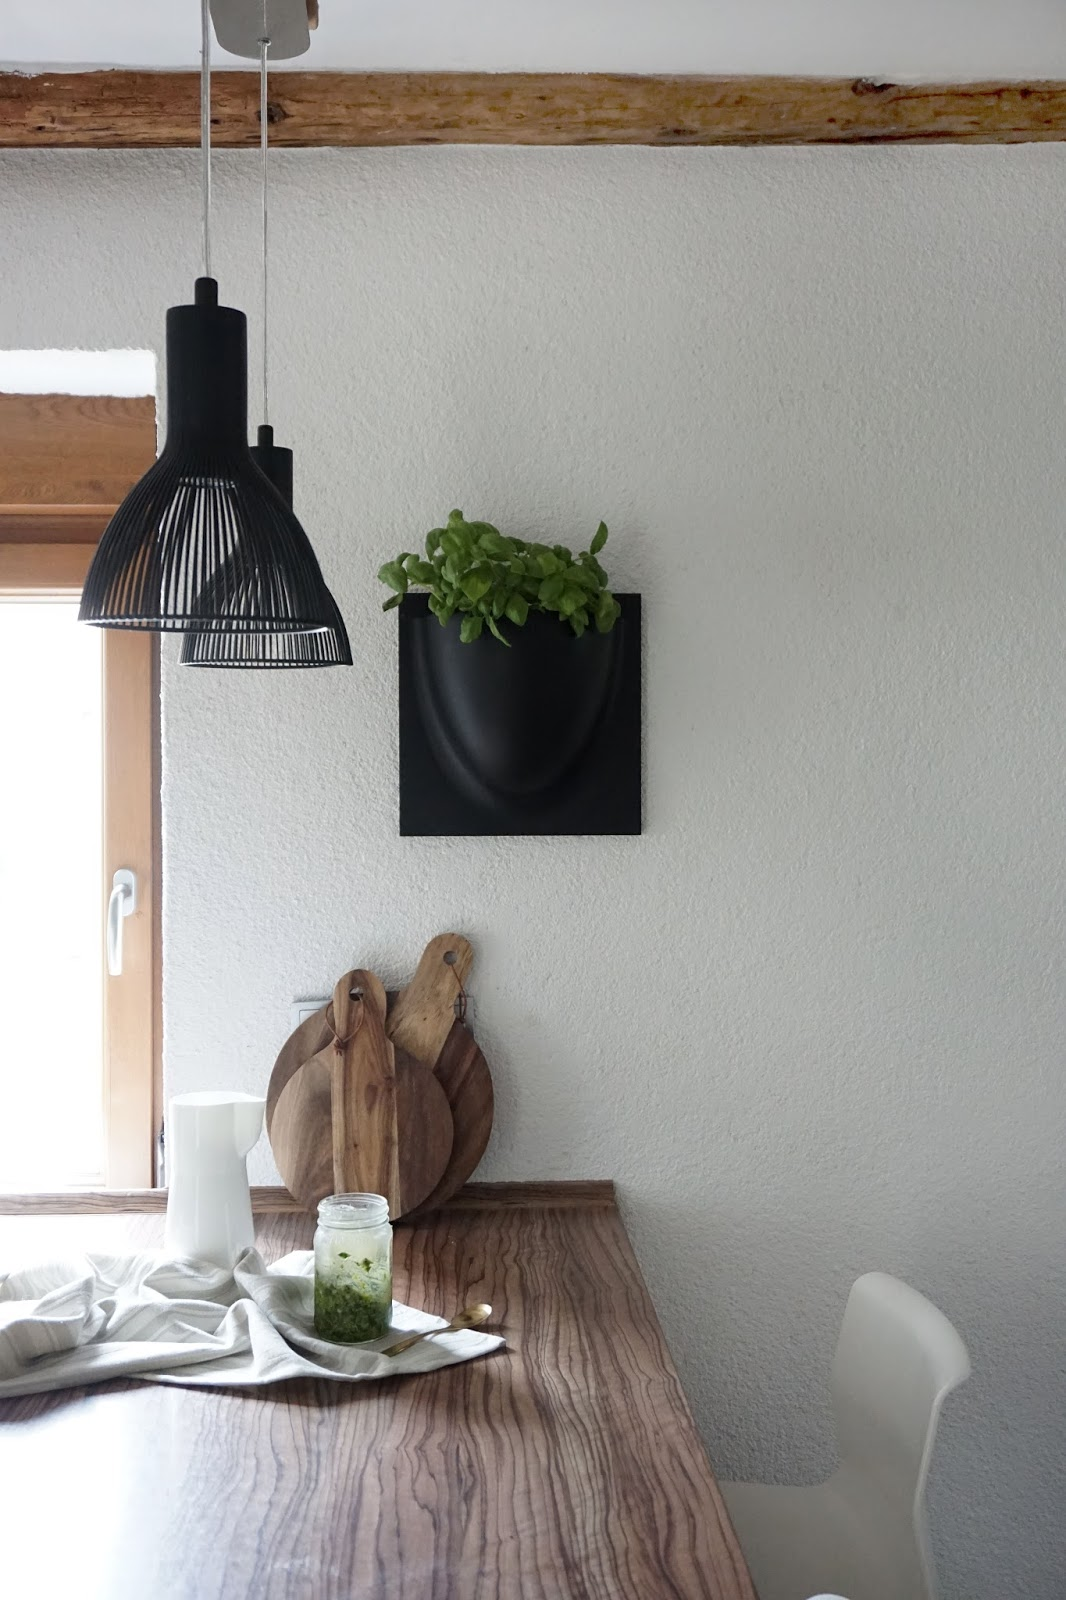 Interiorcheck vertiplants copenhagen s t i l r e i c h - Stilreich blog instagram ...